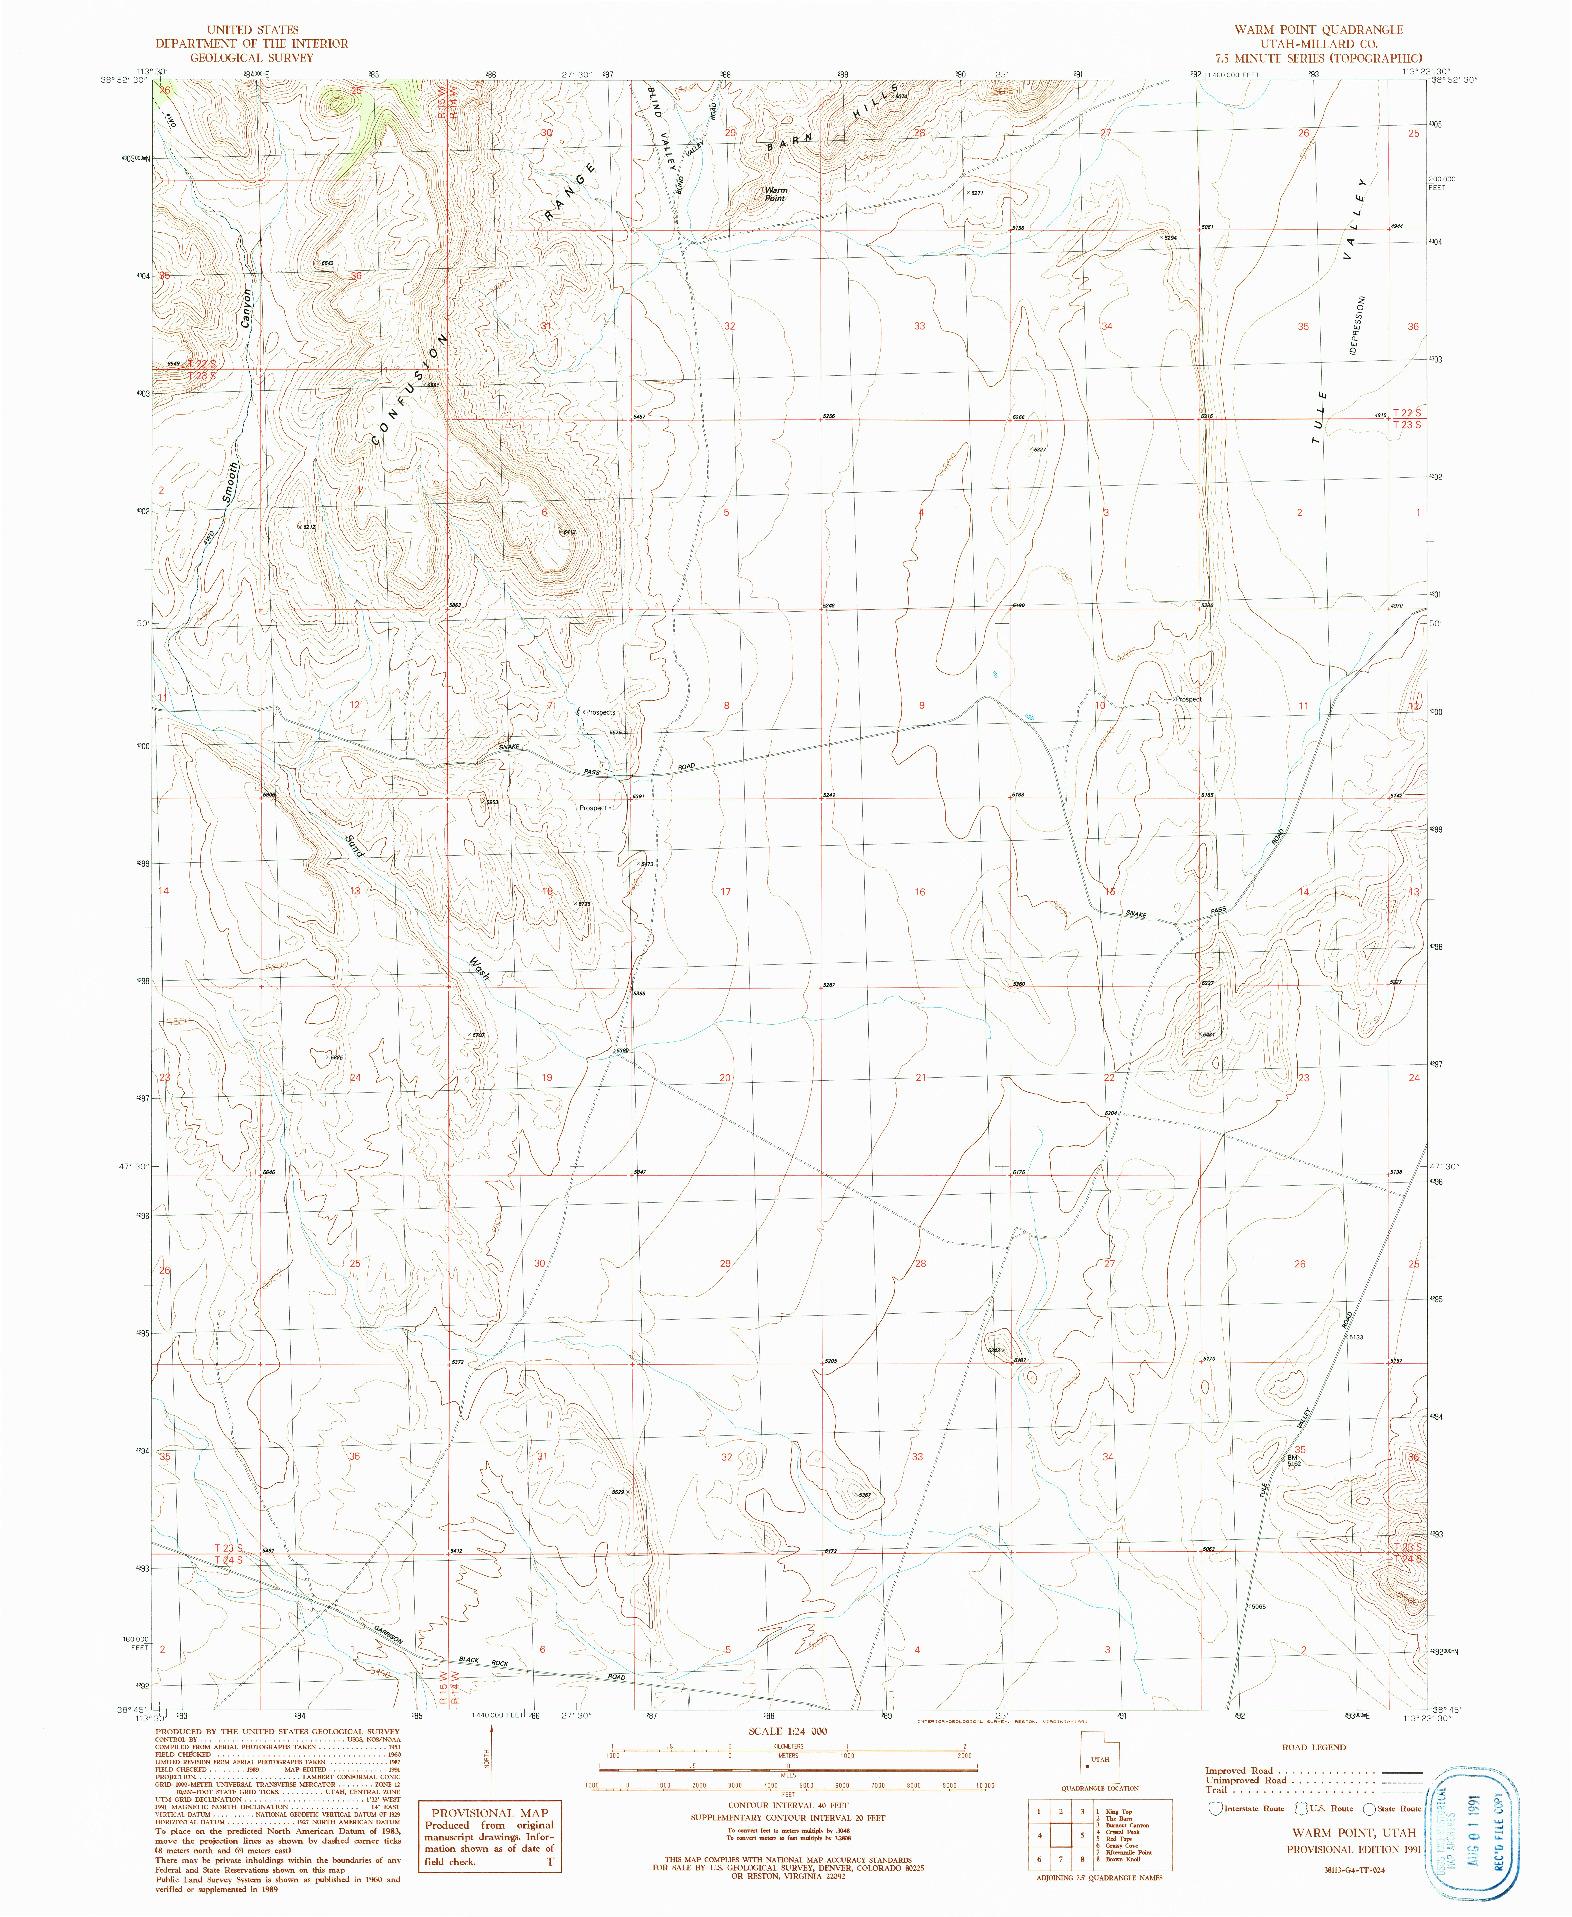 USGS 1:24000-SCALE QUADRANGLE FOR WARM POINT, UT 1991